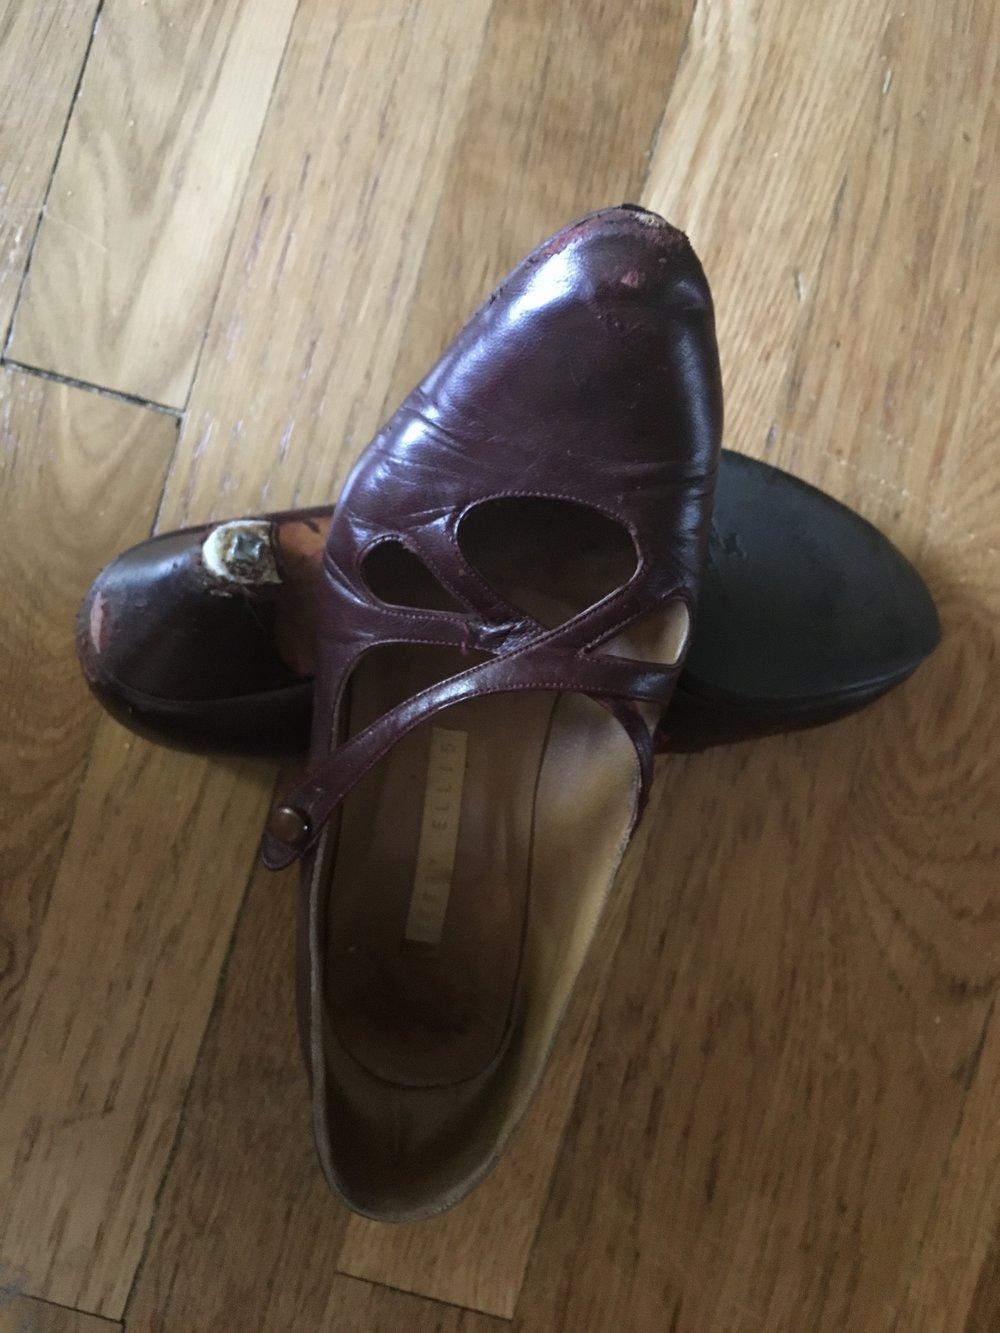 My last high heels.